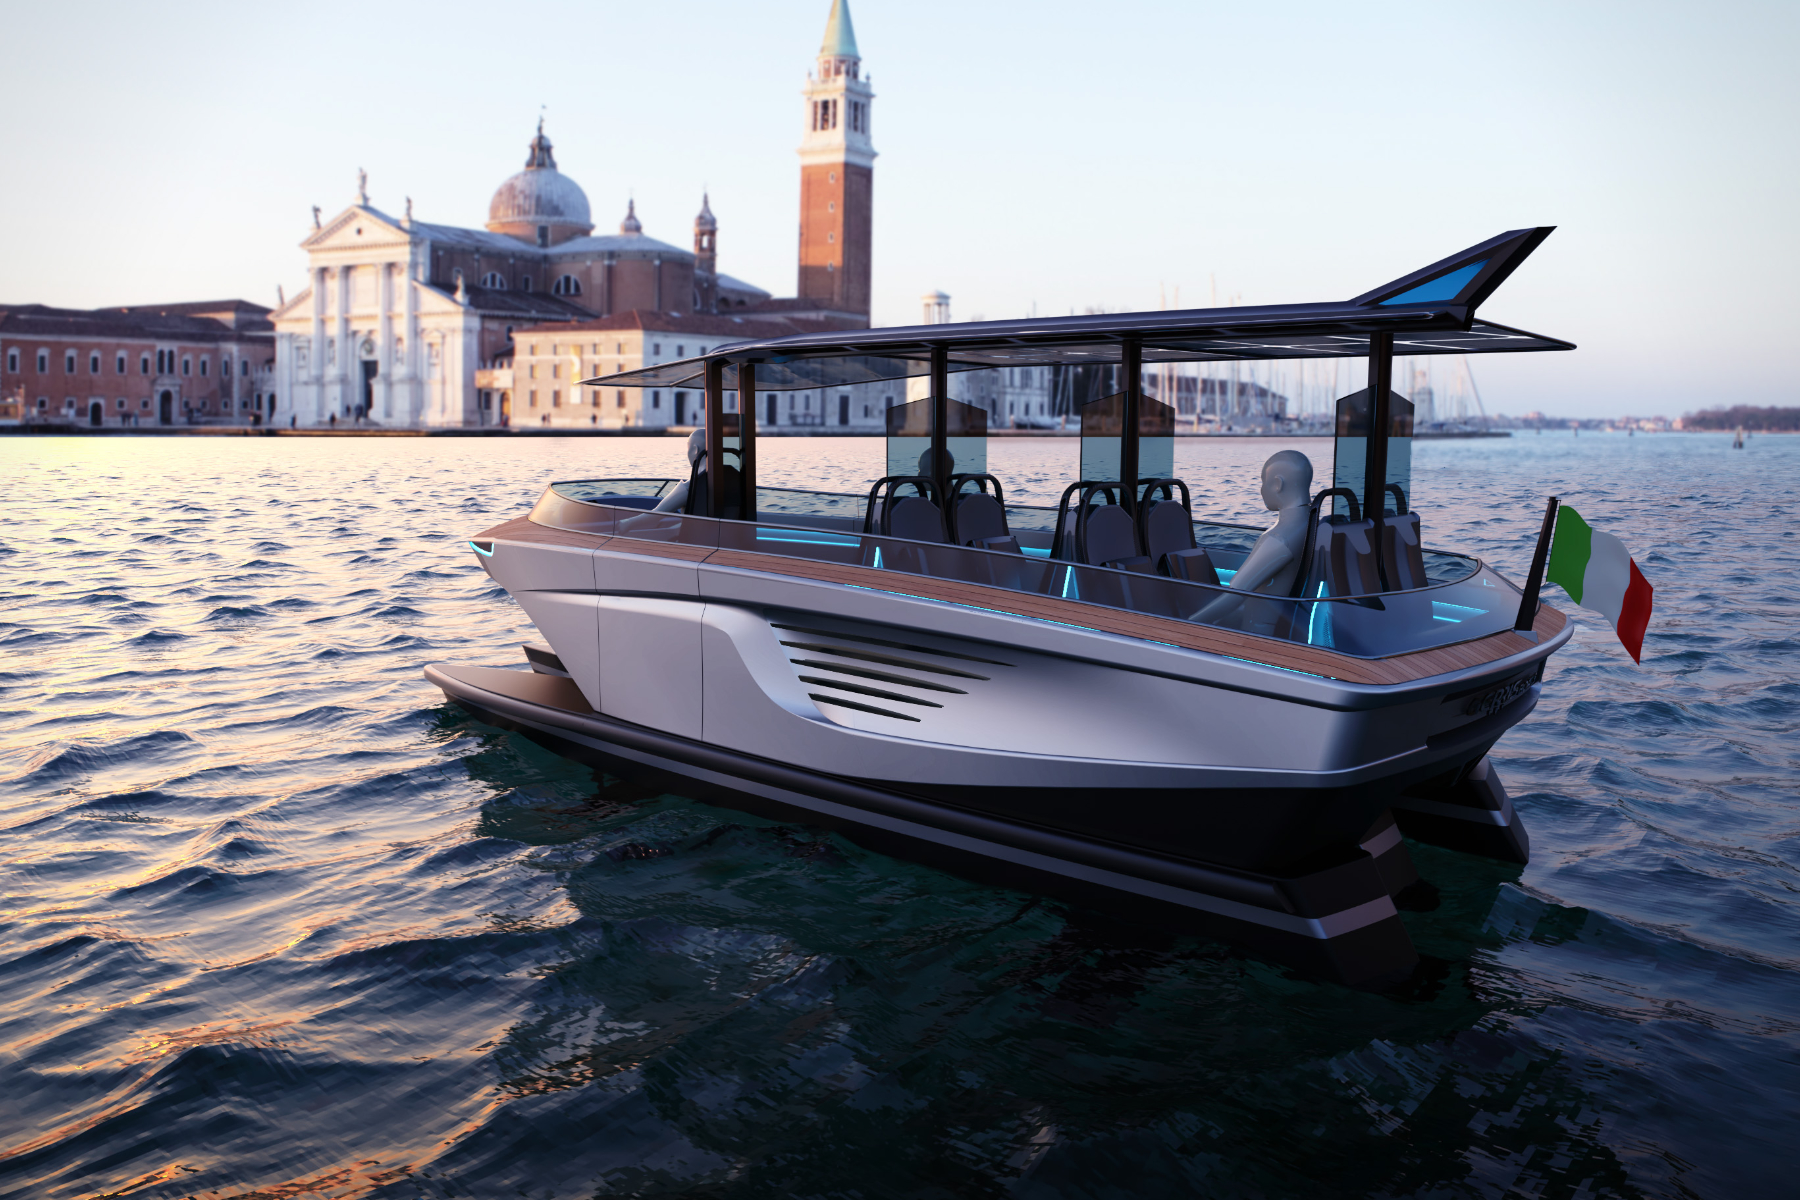 Immagina una Venezia senza onde